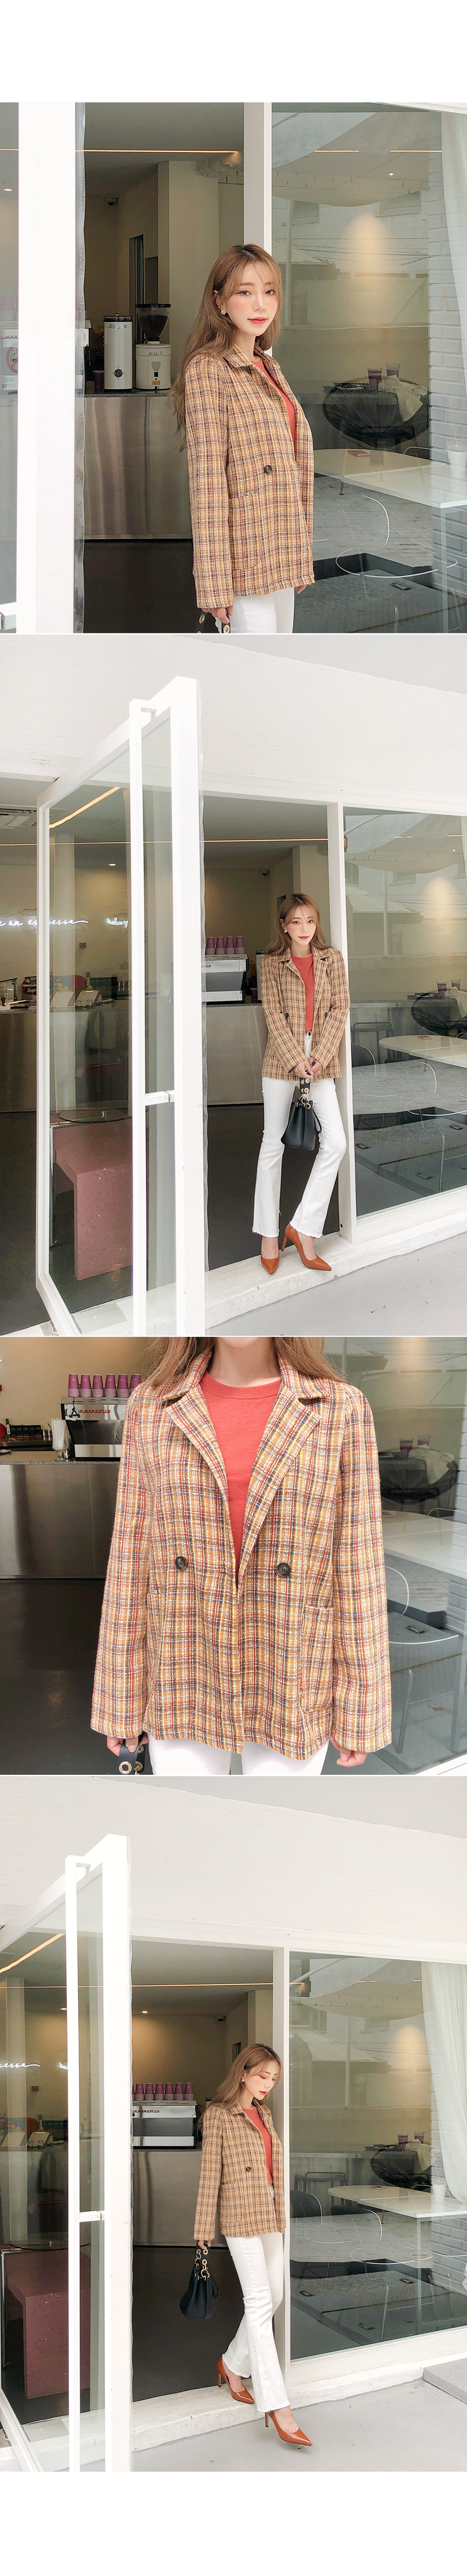 Attractive tweed jacket